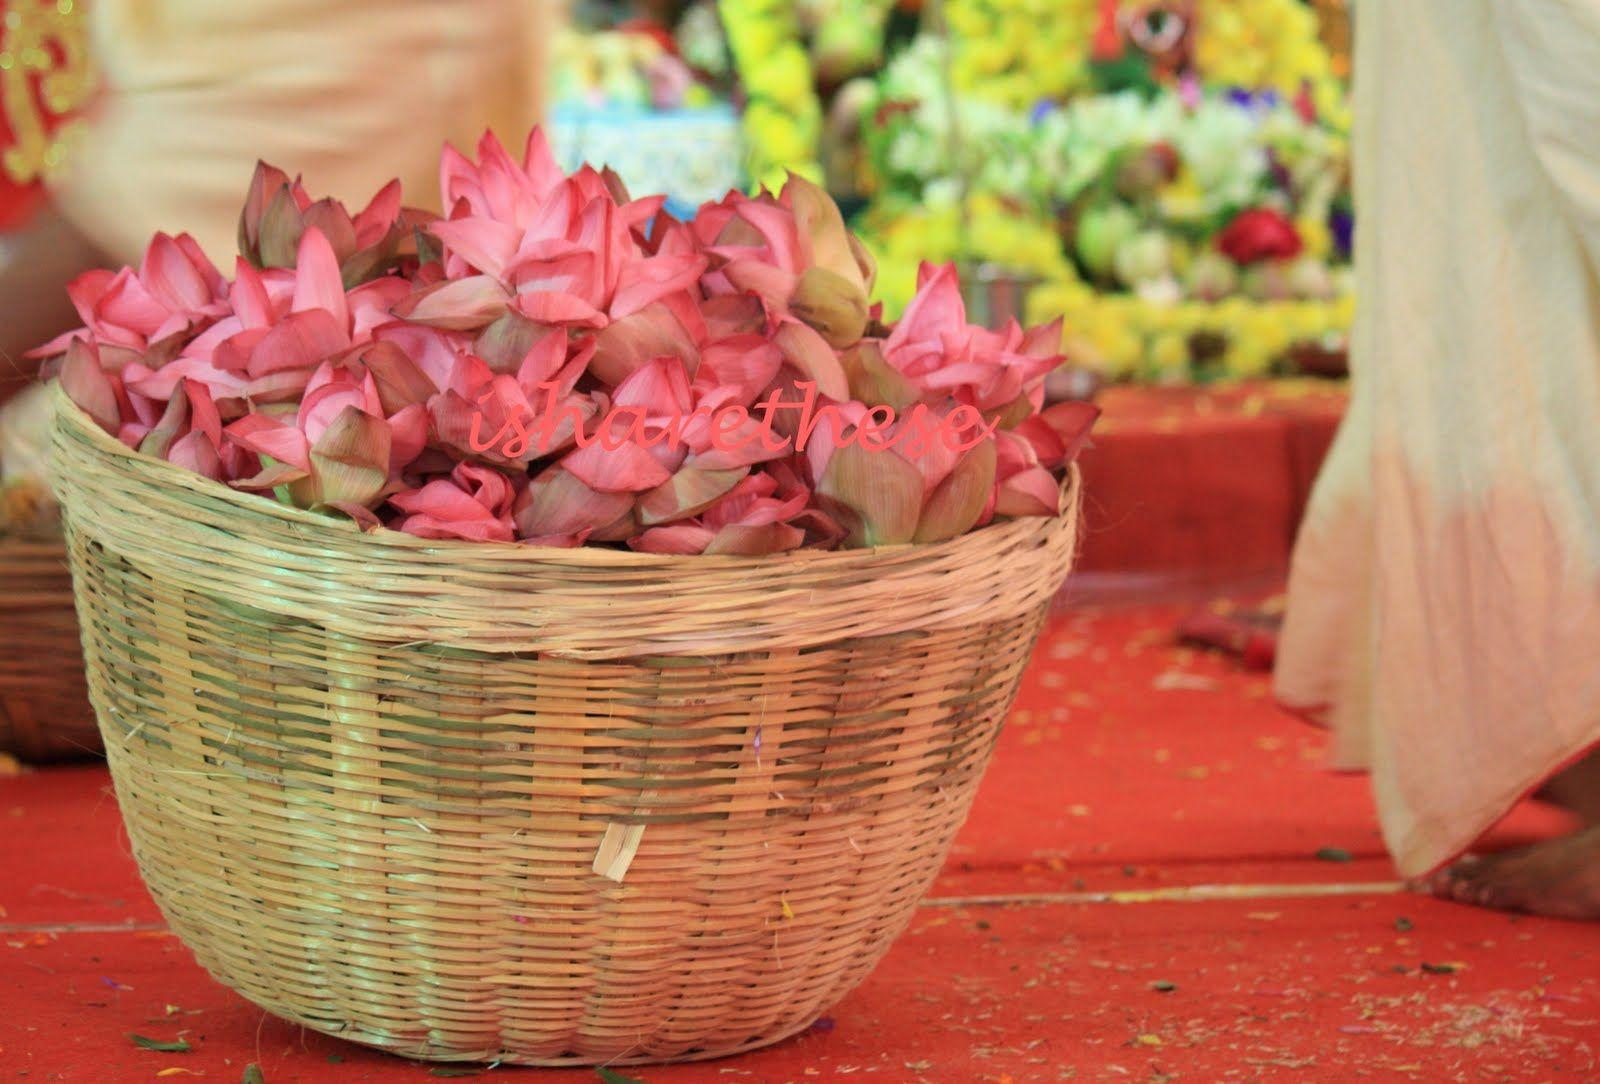 Pin By Sreedevi Balaji On Hindu Holy Plants Pinterest Plants